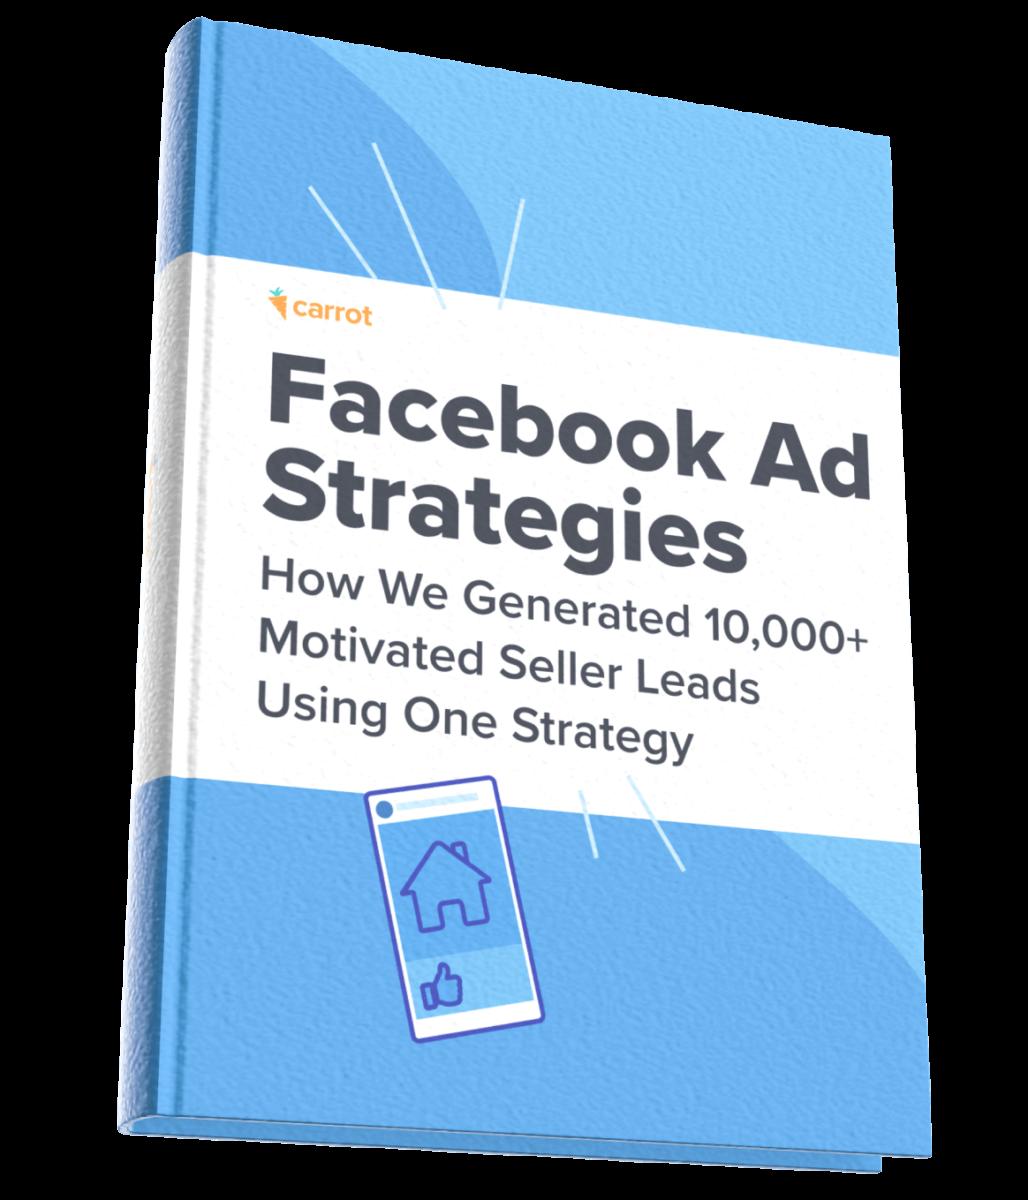 facebook ad strategies cover